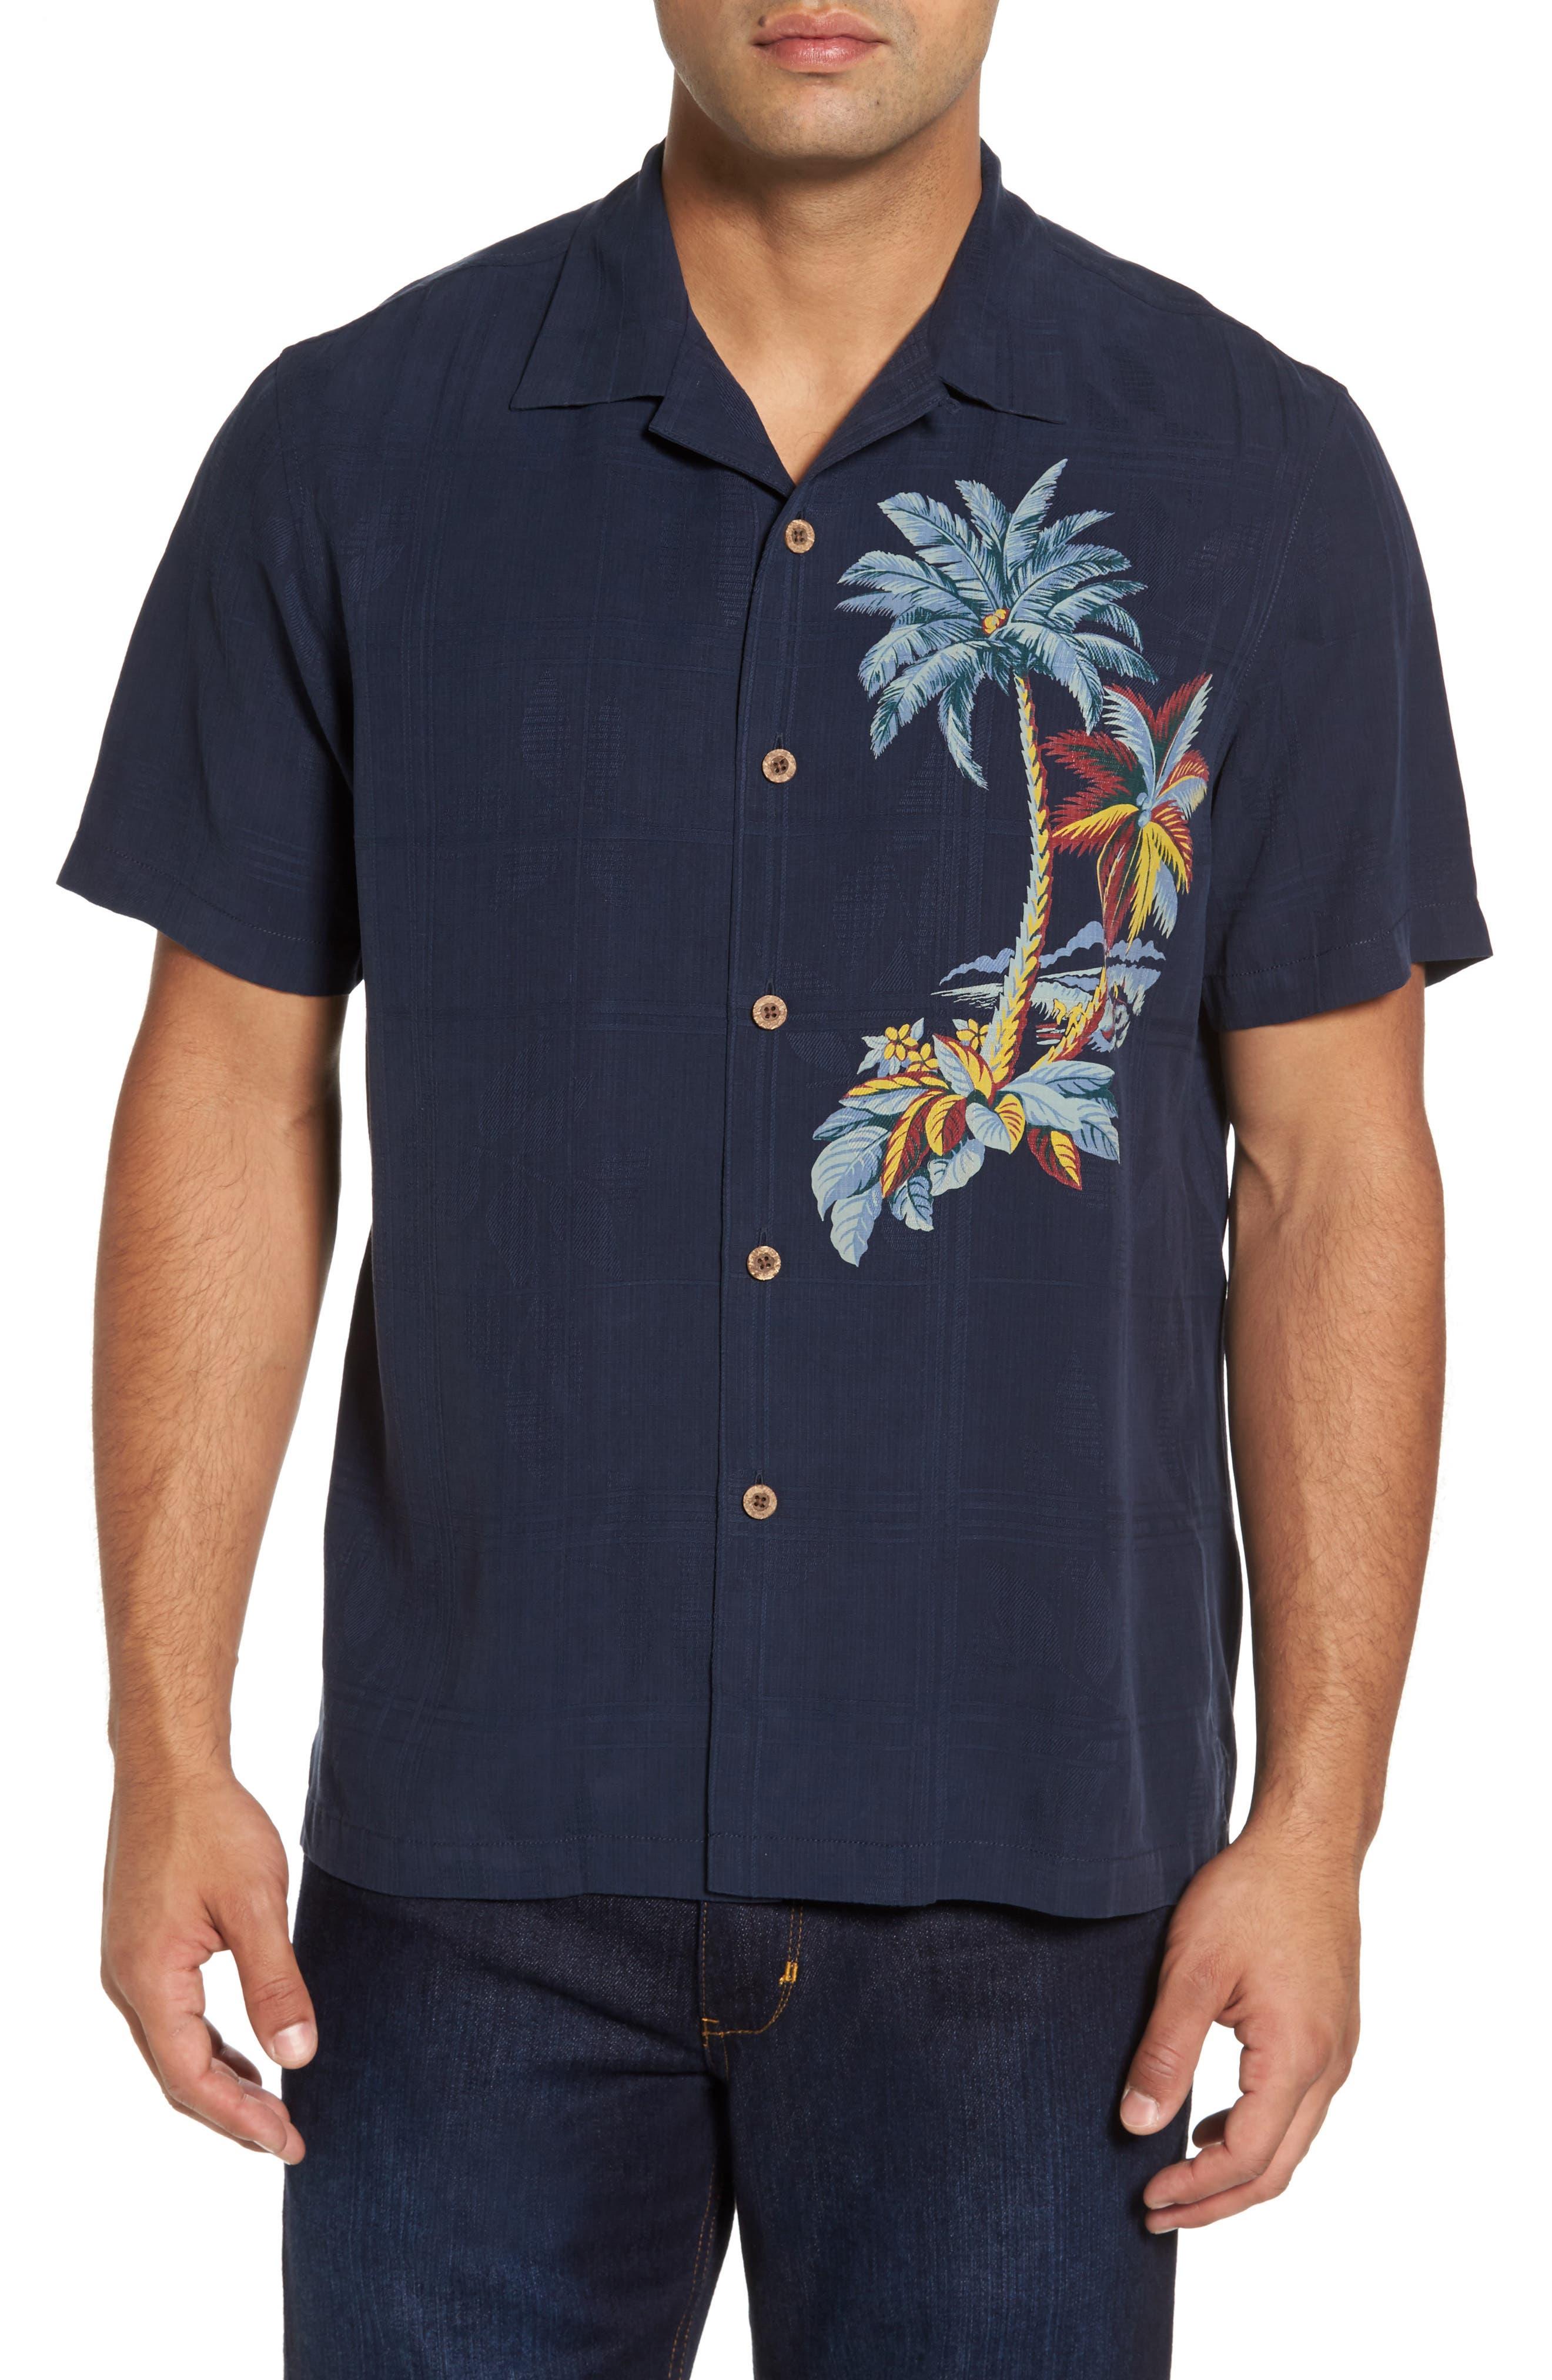 Main Image - Tommy Bahama Moonlight Palms Silk Camp Shirt